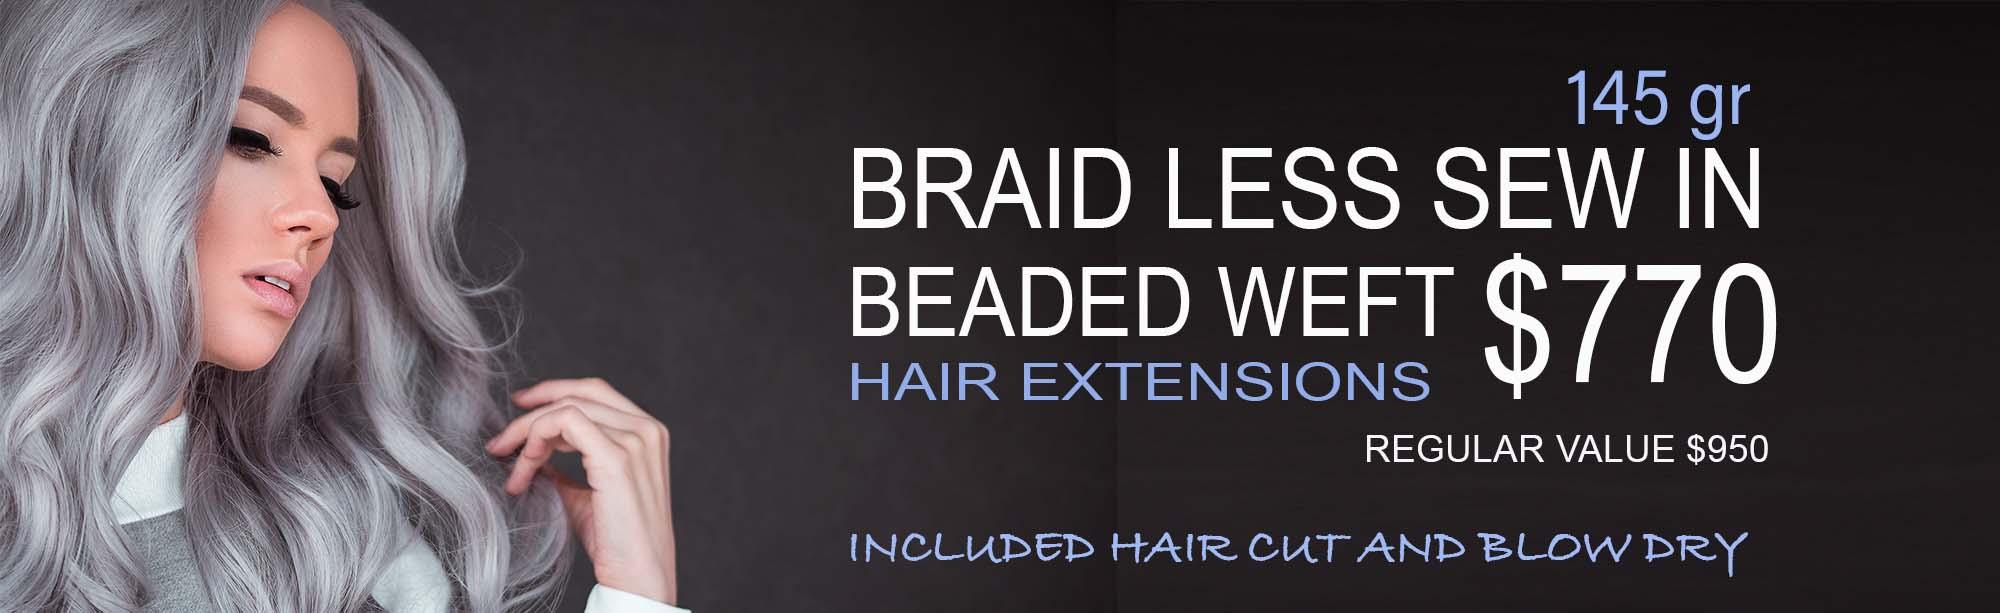 braid less sew in Hair Extensions Miami